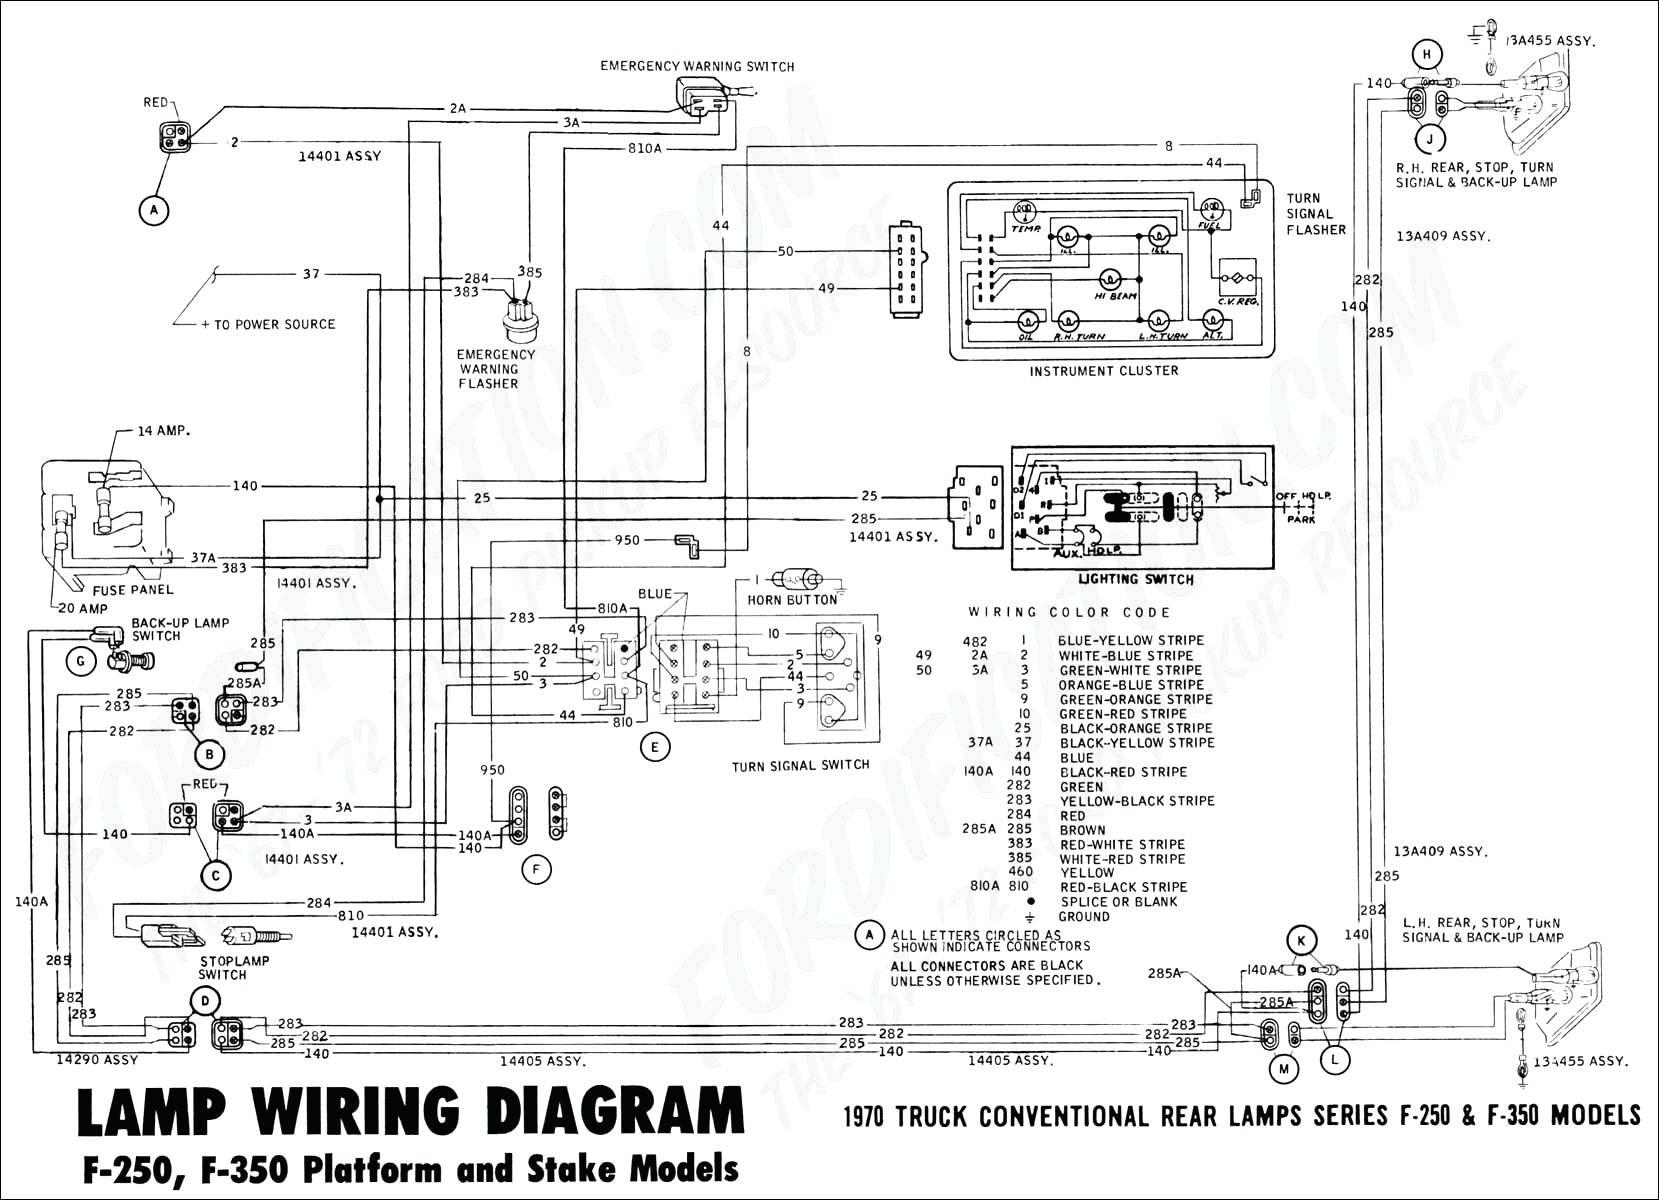 05 chevy truck tail light bedradings schema